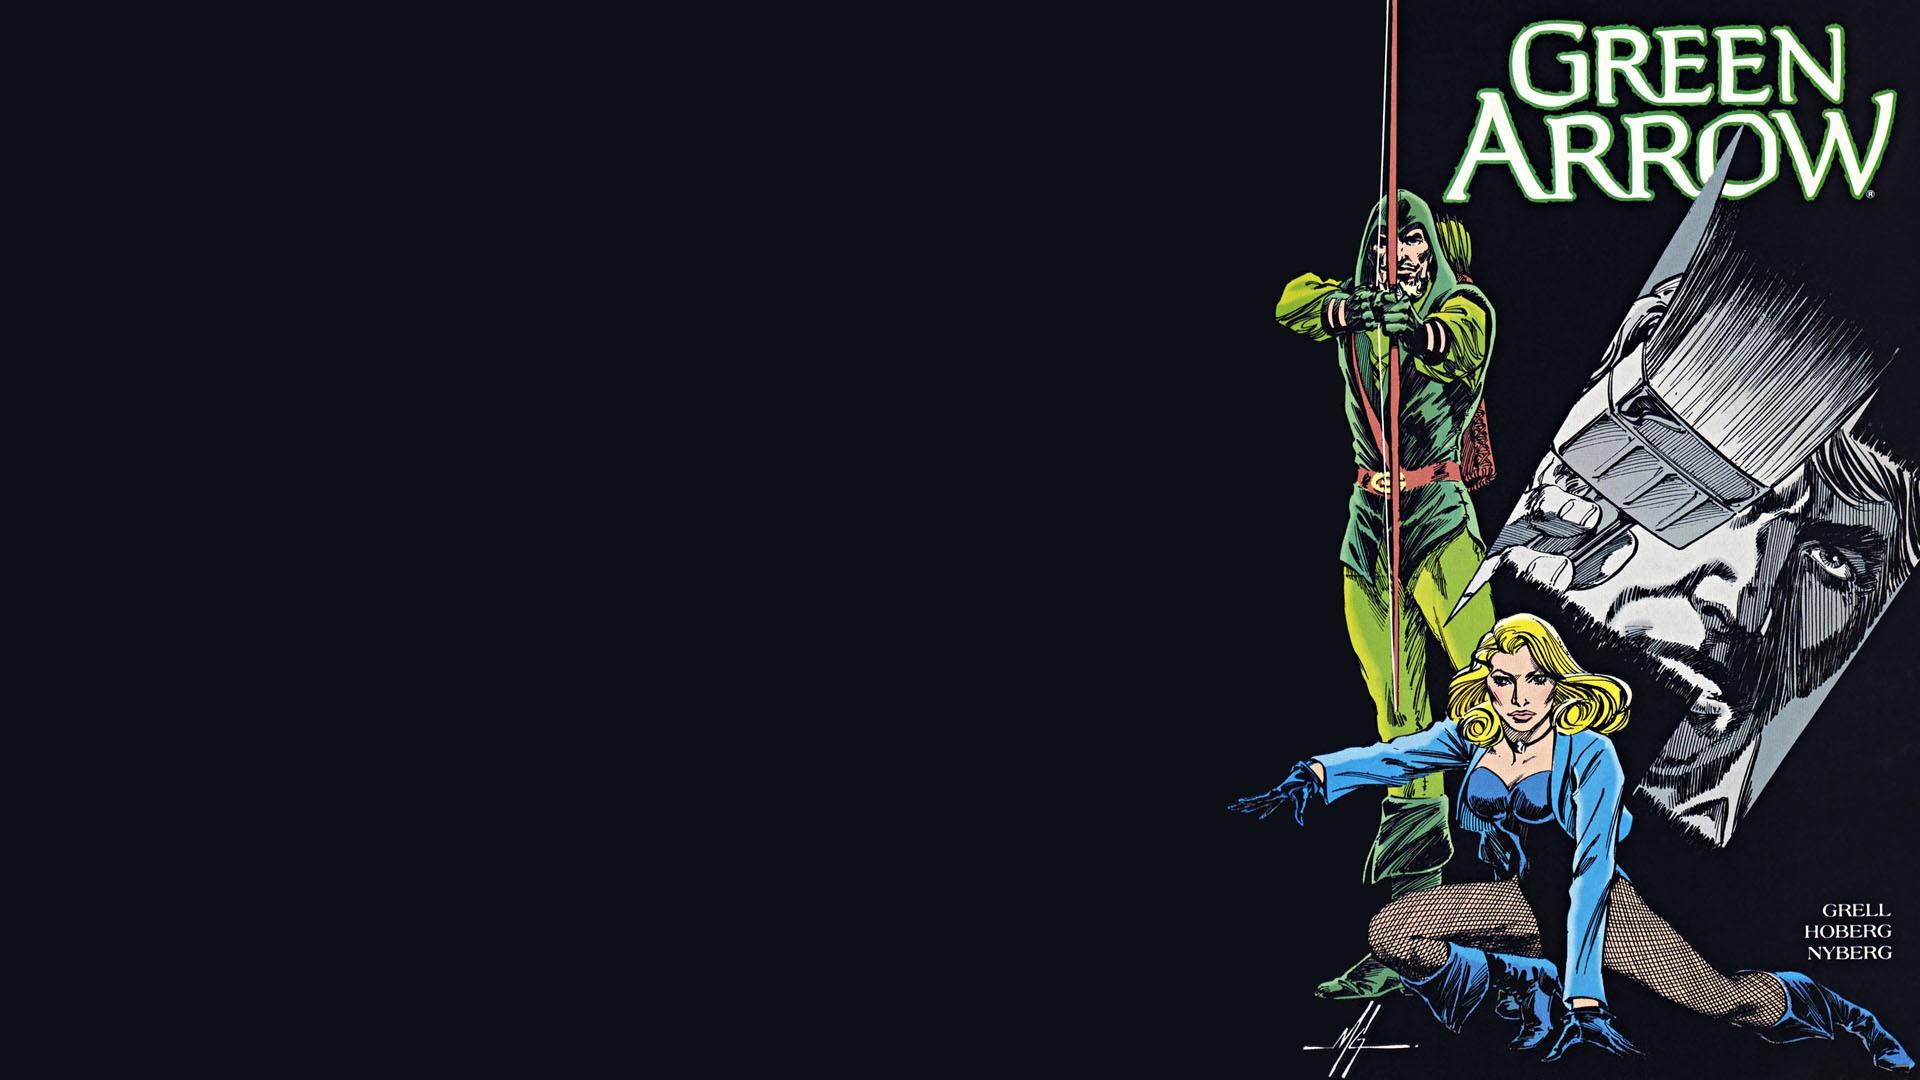 Green Arrow Computer Wallpapers Desktop Backgrounds 1920x1080 ID 1920x1080